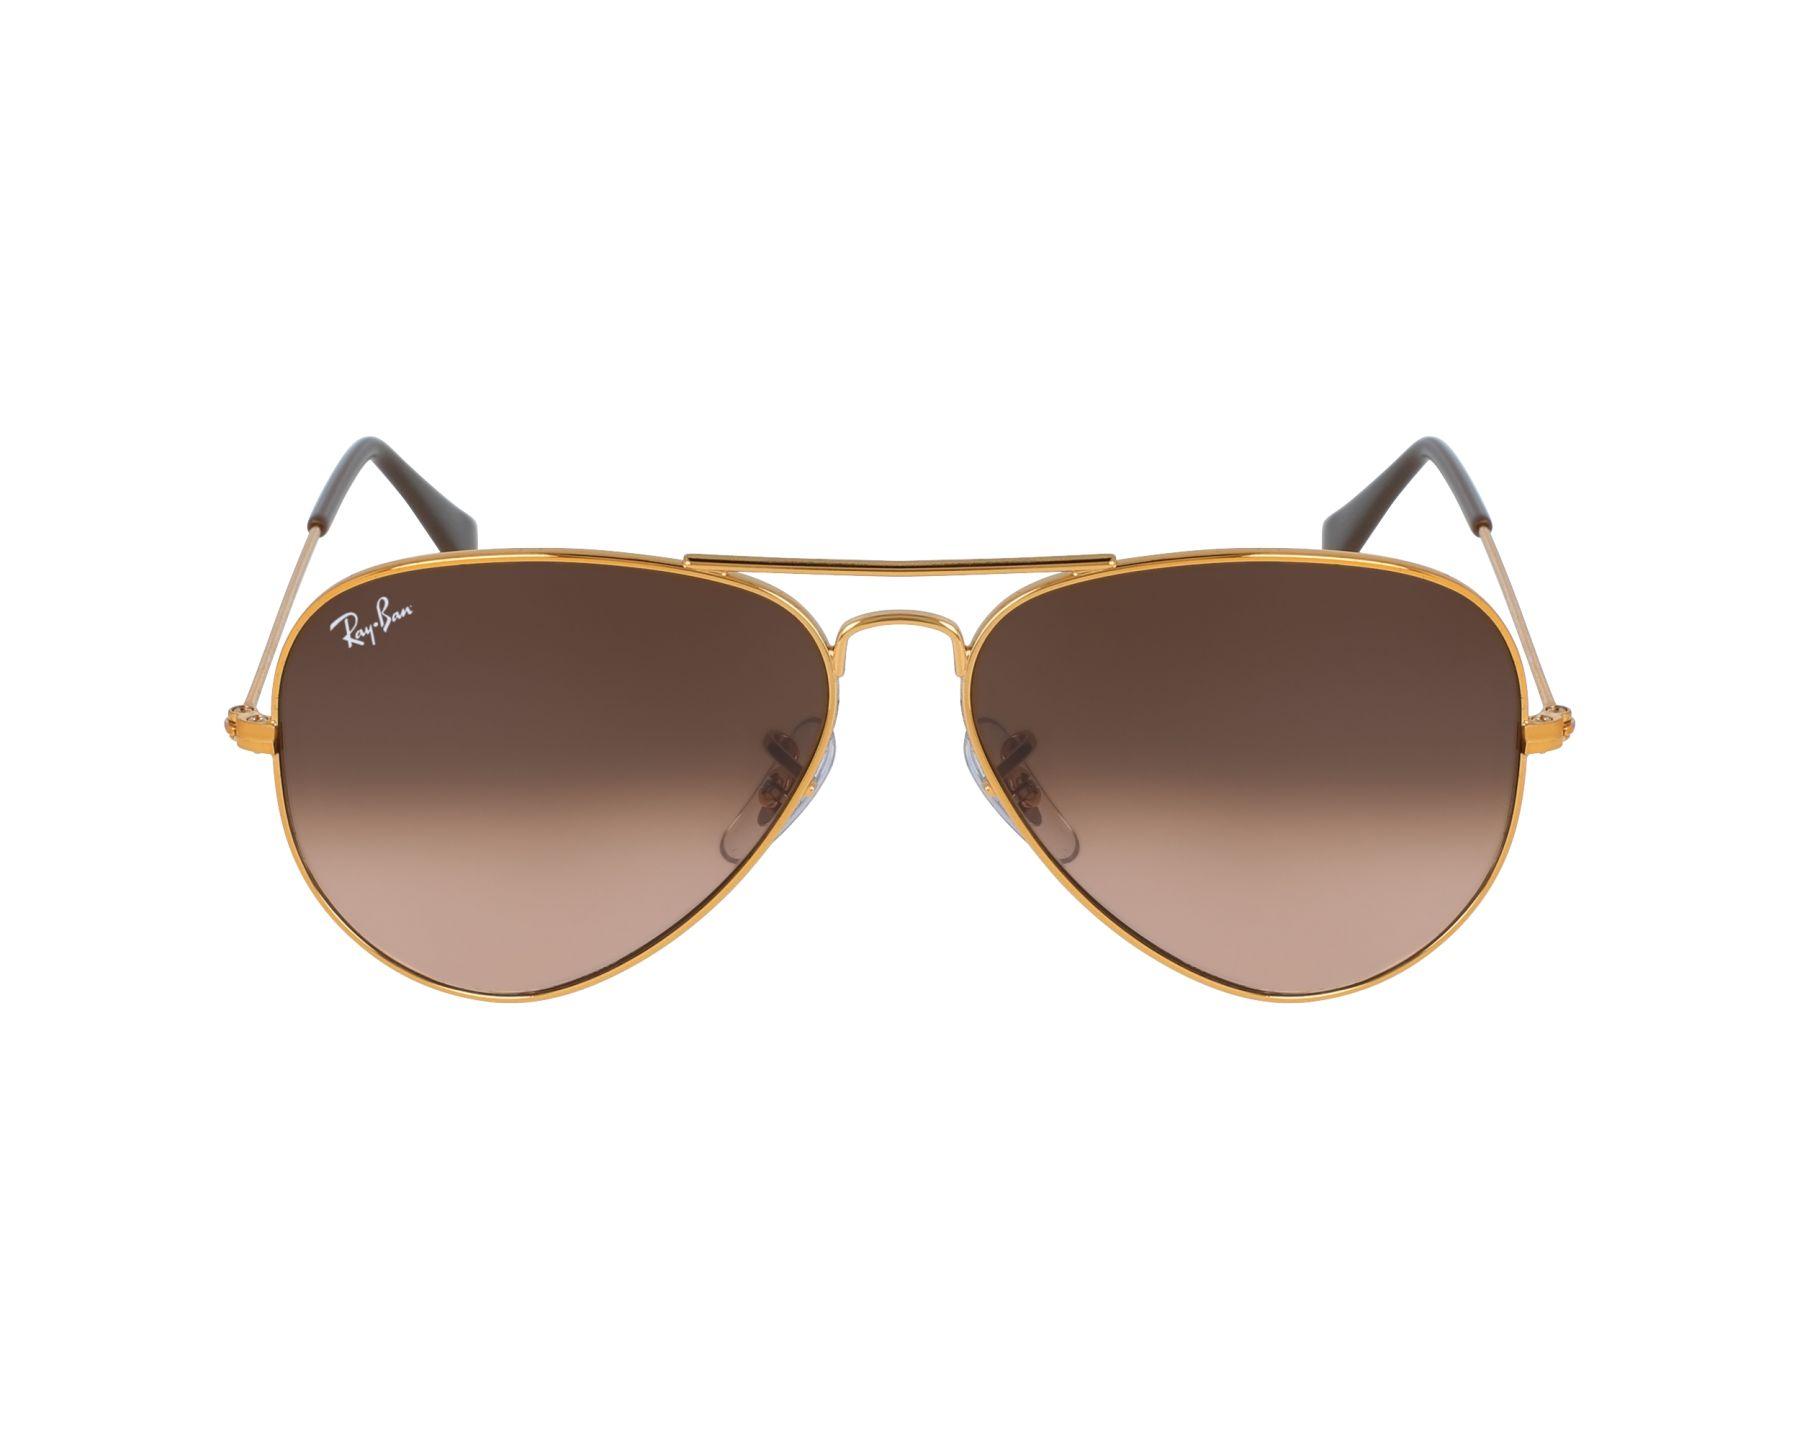 buy ray ban sunglasses rb 3025 9001a5 online visionet uk. Black Bedroom Furniture Sets. Home Design Ideas